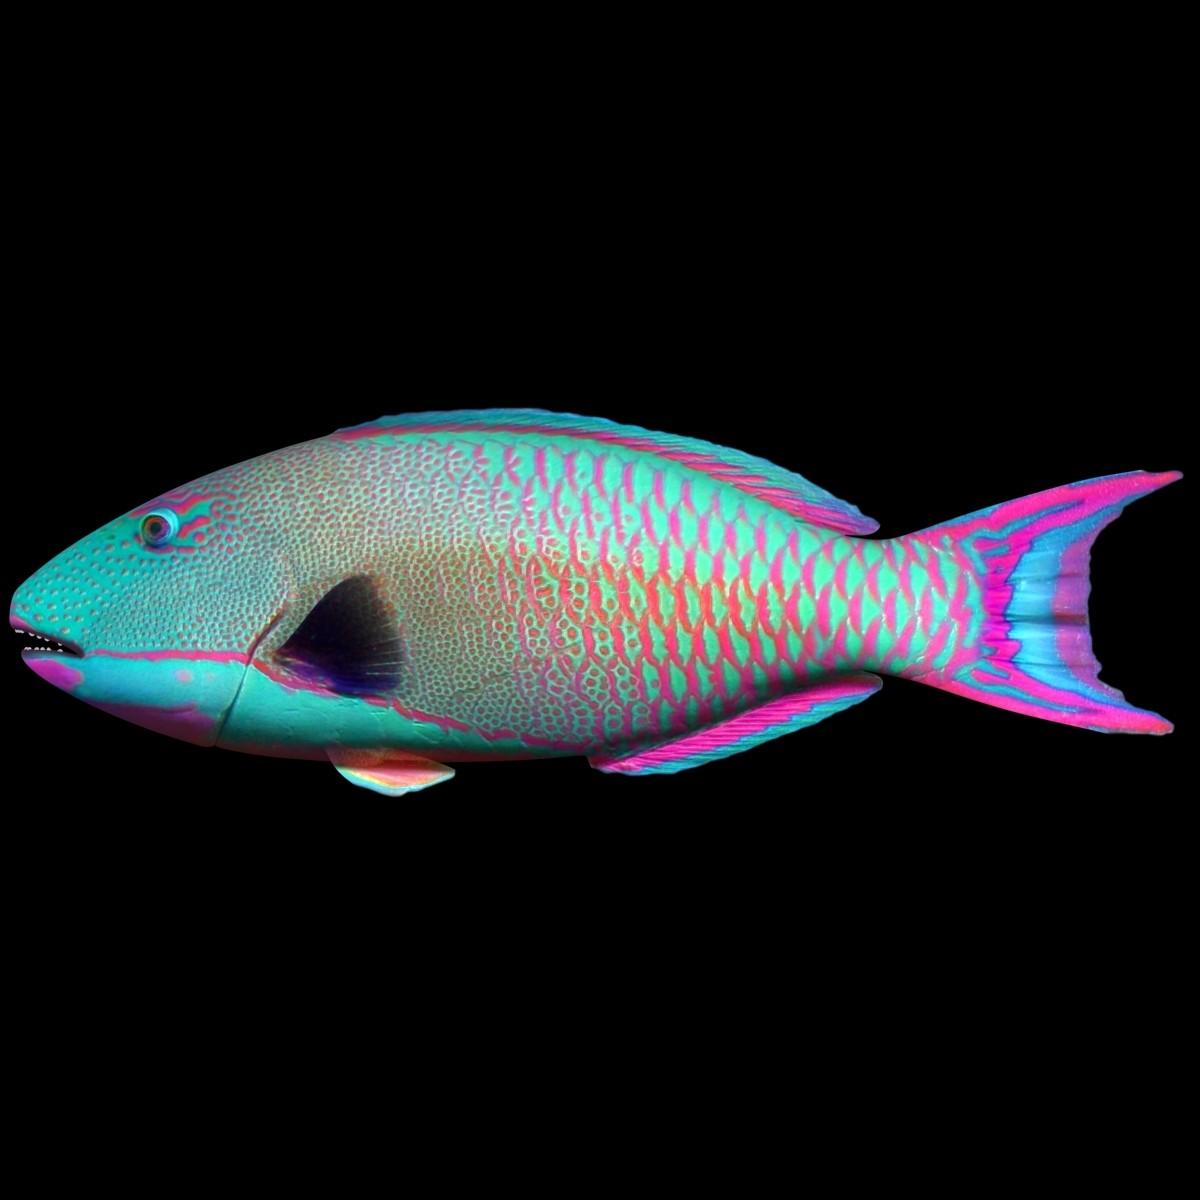 Bicolor-Parrotfish_Rr_02.jpg